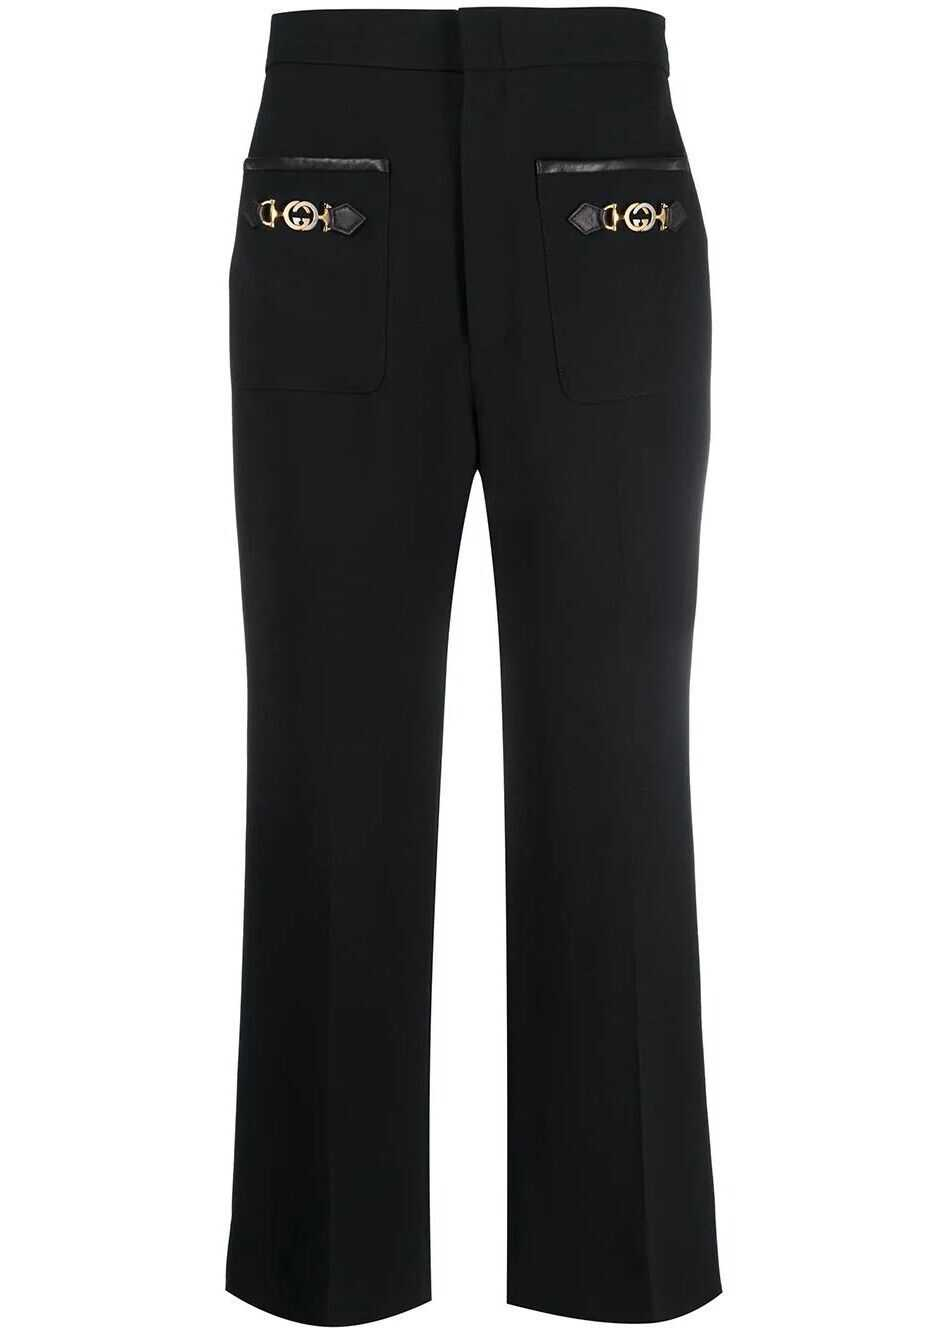 Gucci Silk Pants BLACK